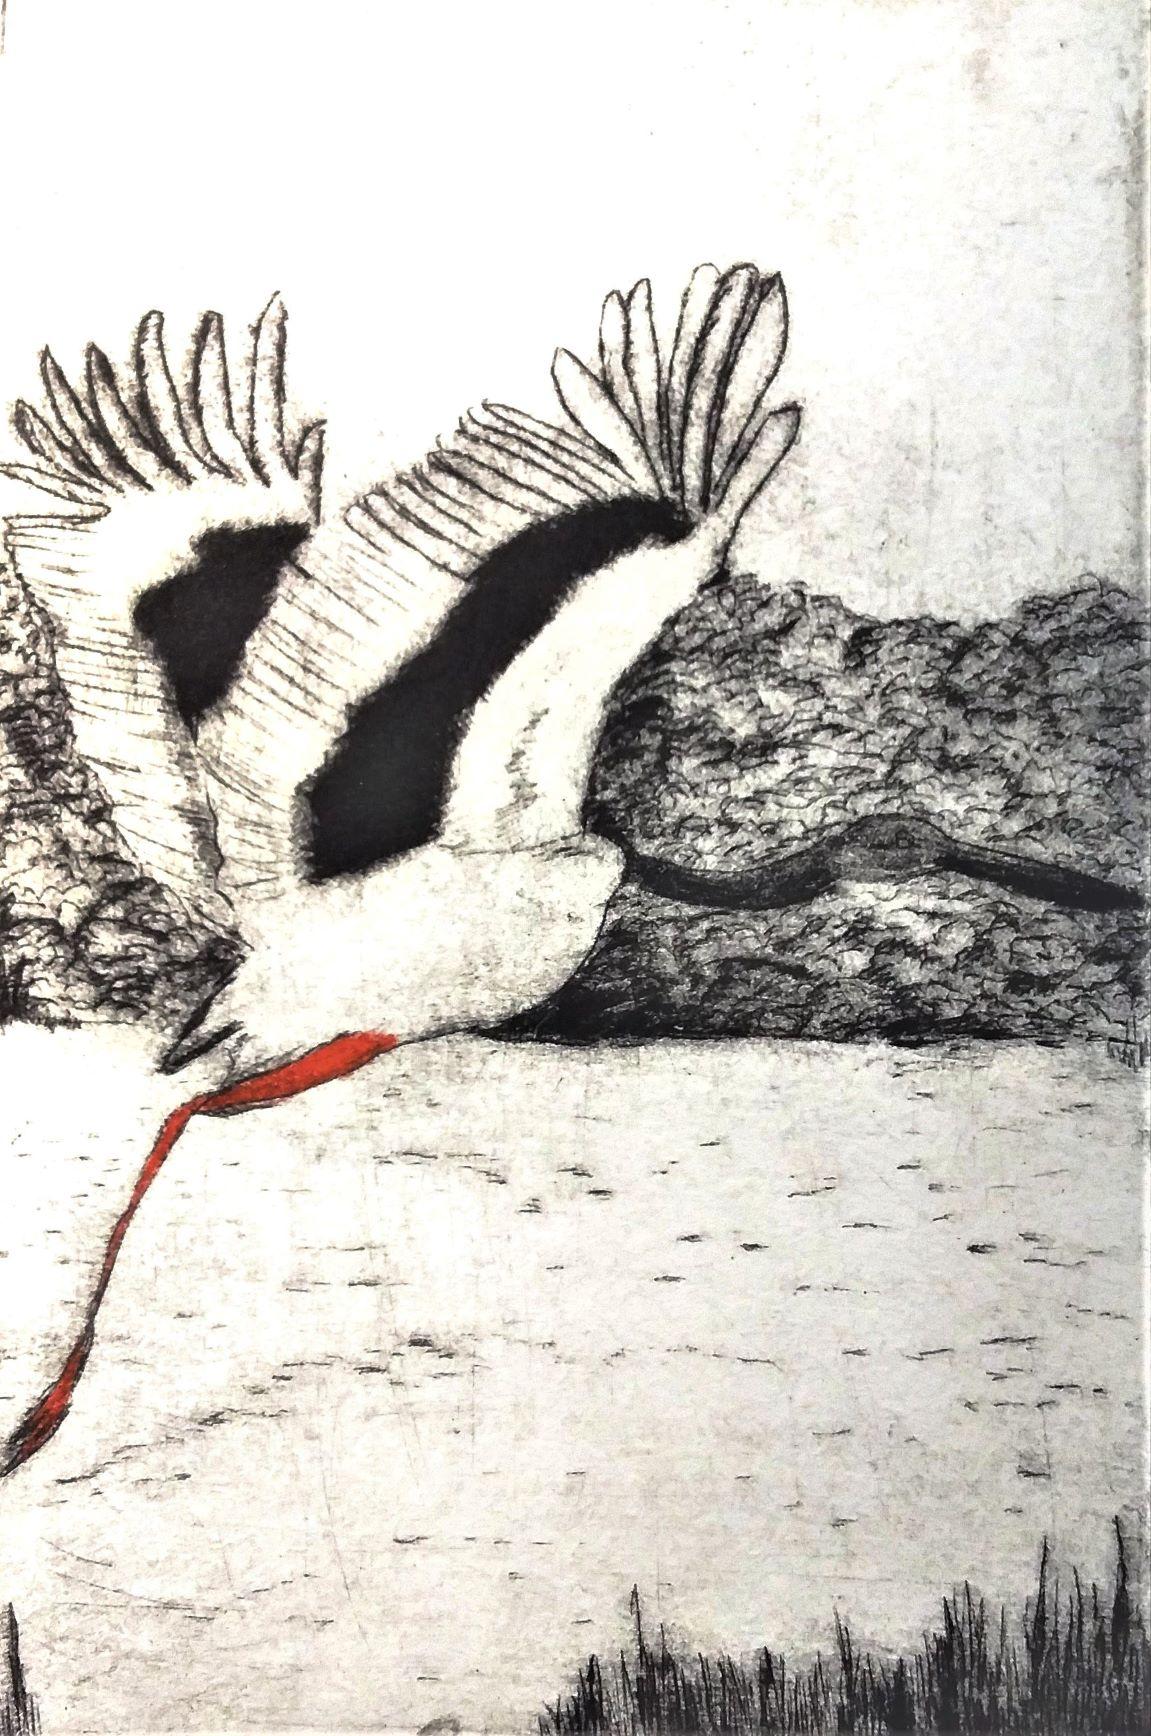 Go (Black-neck stork)_Dryponint_Michelle Hallinan.jpg